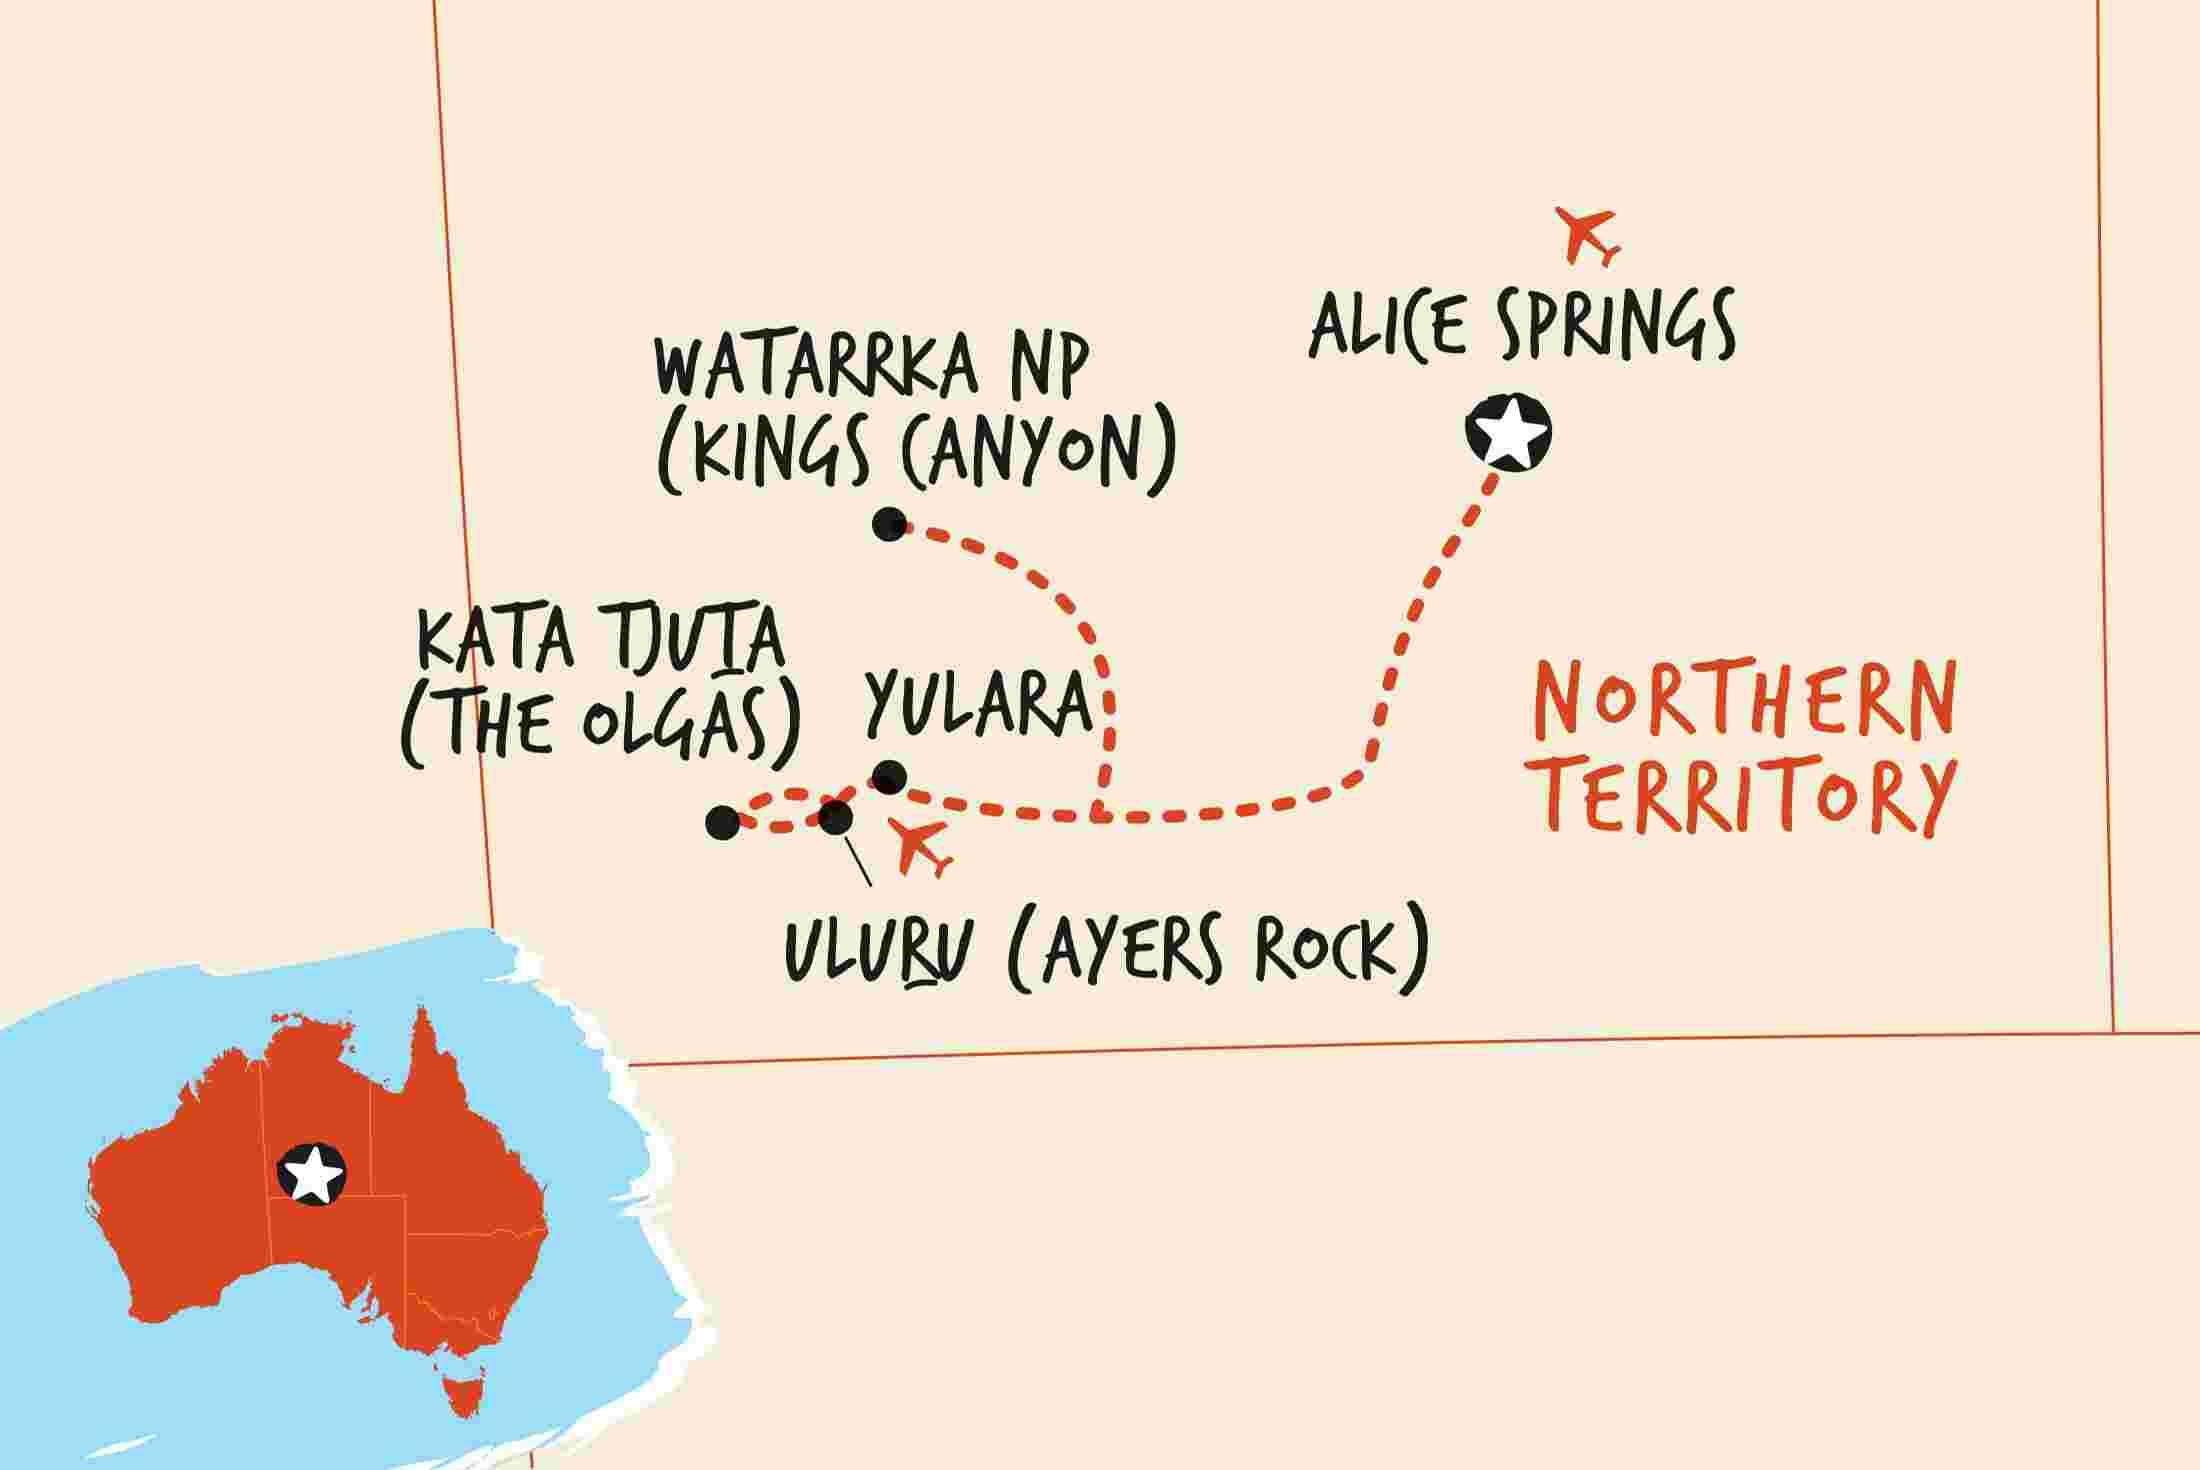 3 Day Uluru Adventure Original Adventure Tours Au